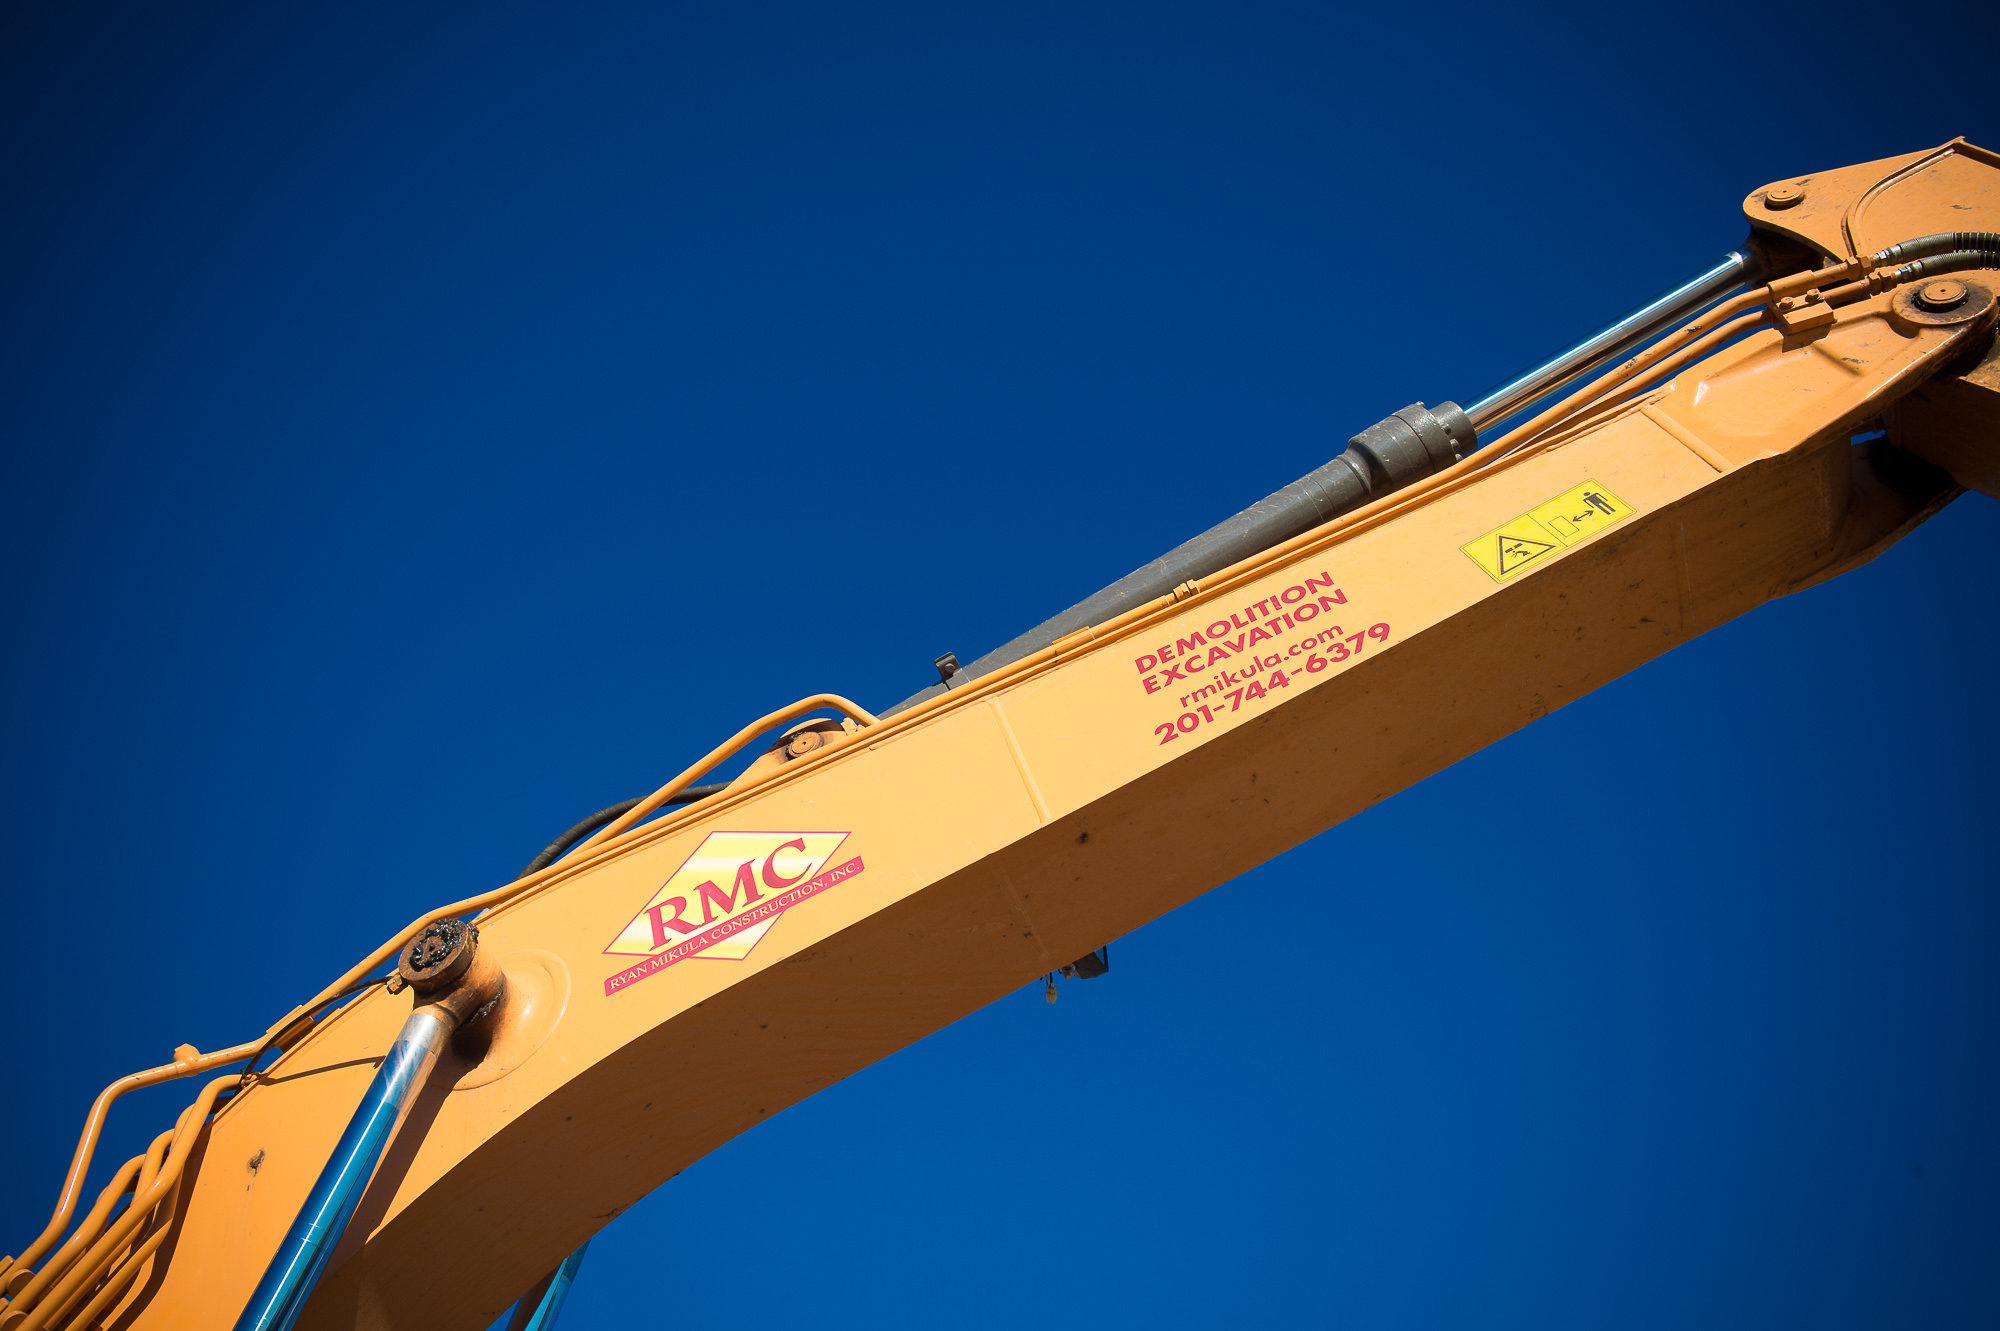 New Jersey demolition business; website photos; Industrial PhotographyLandmark Image Group, David Lau